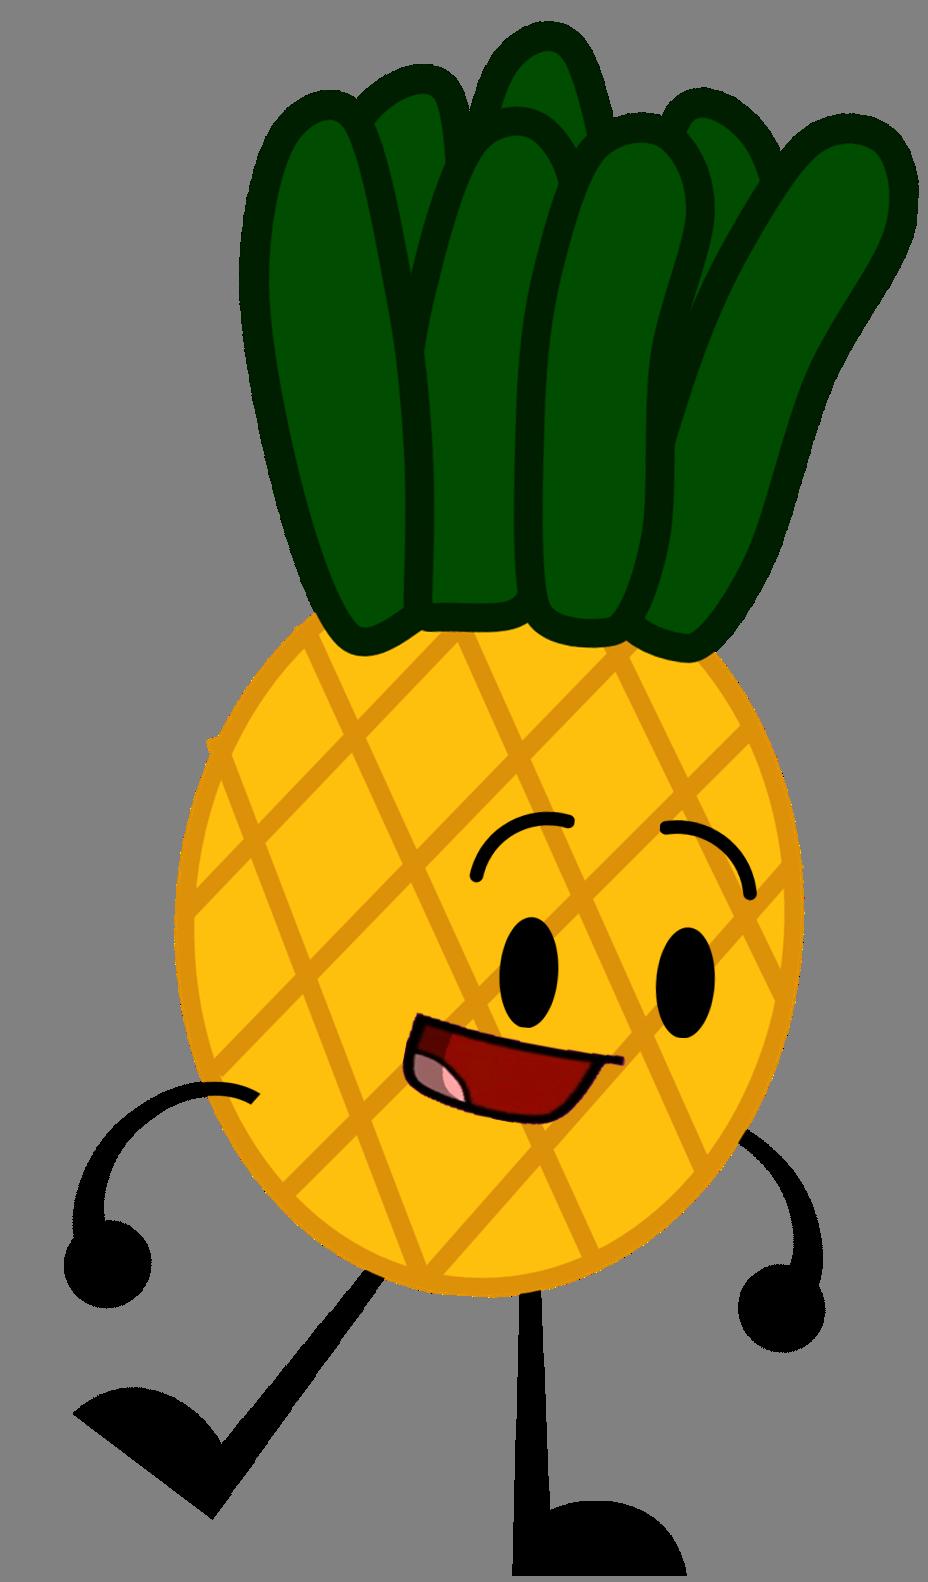 Pineapple clipart object Png Image FANDOM (OC